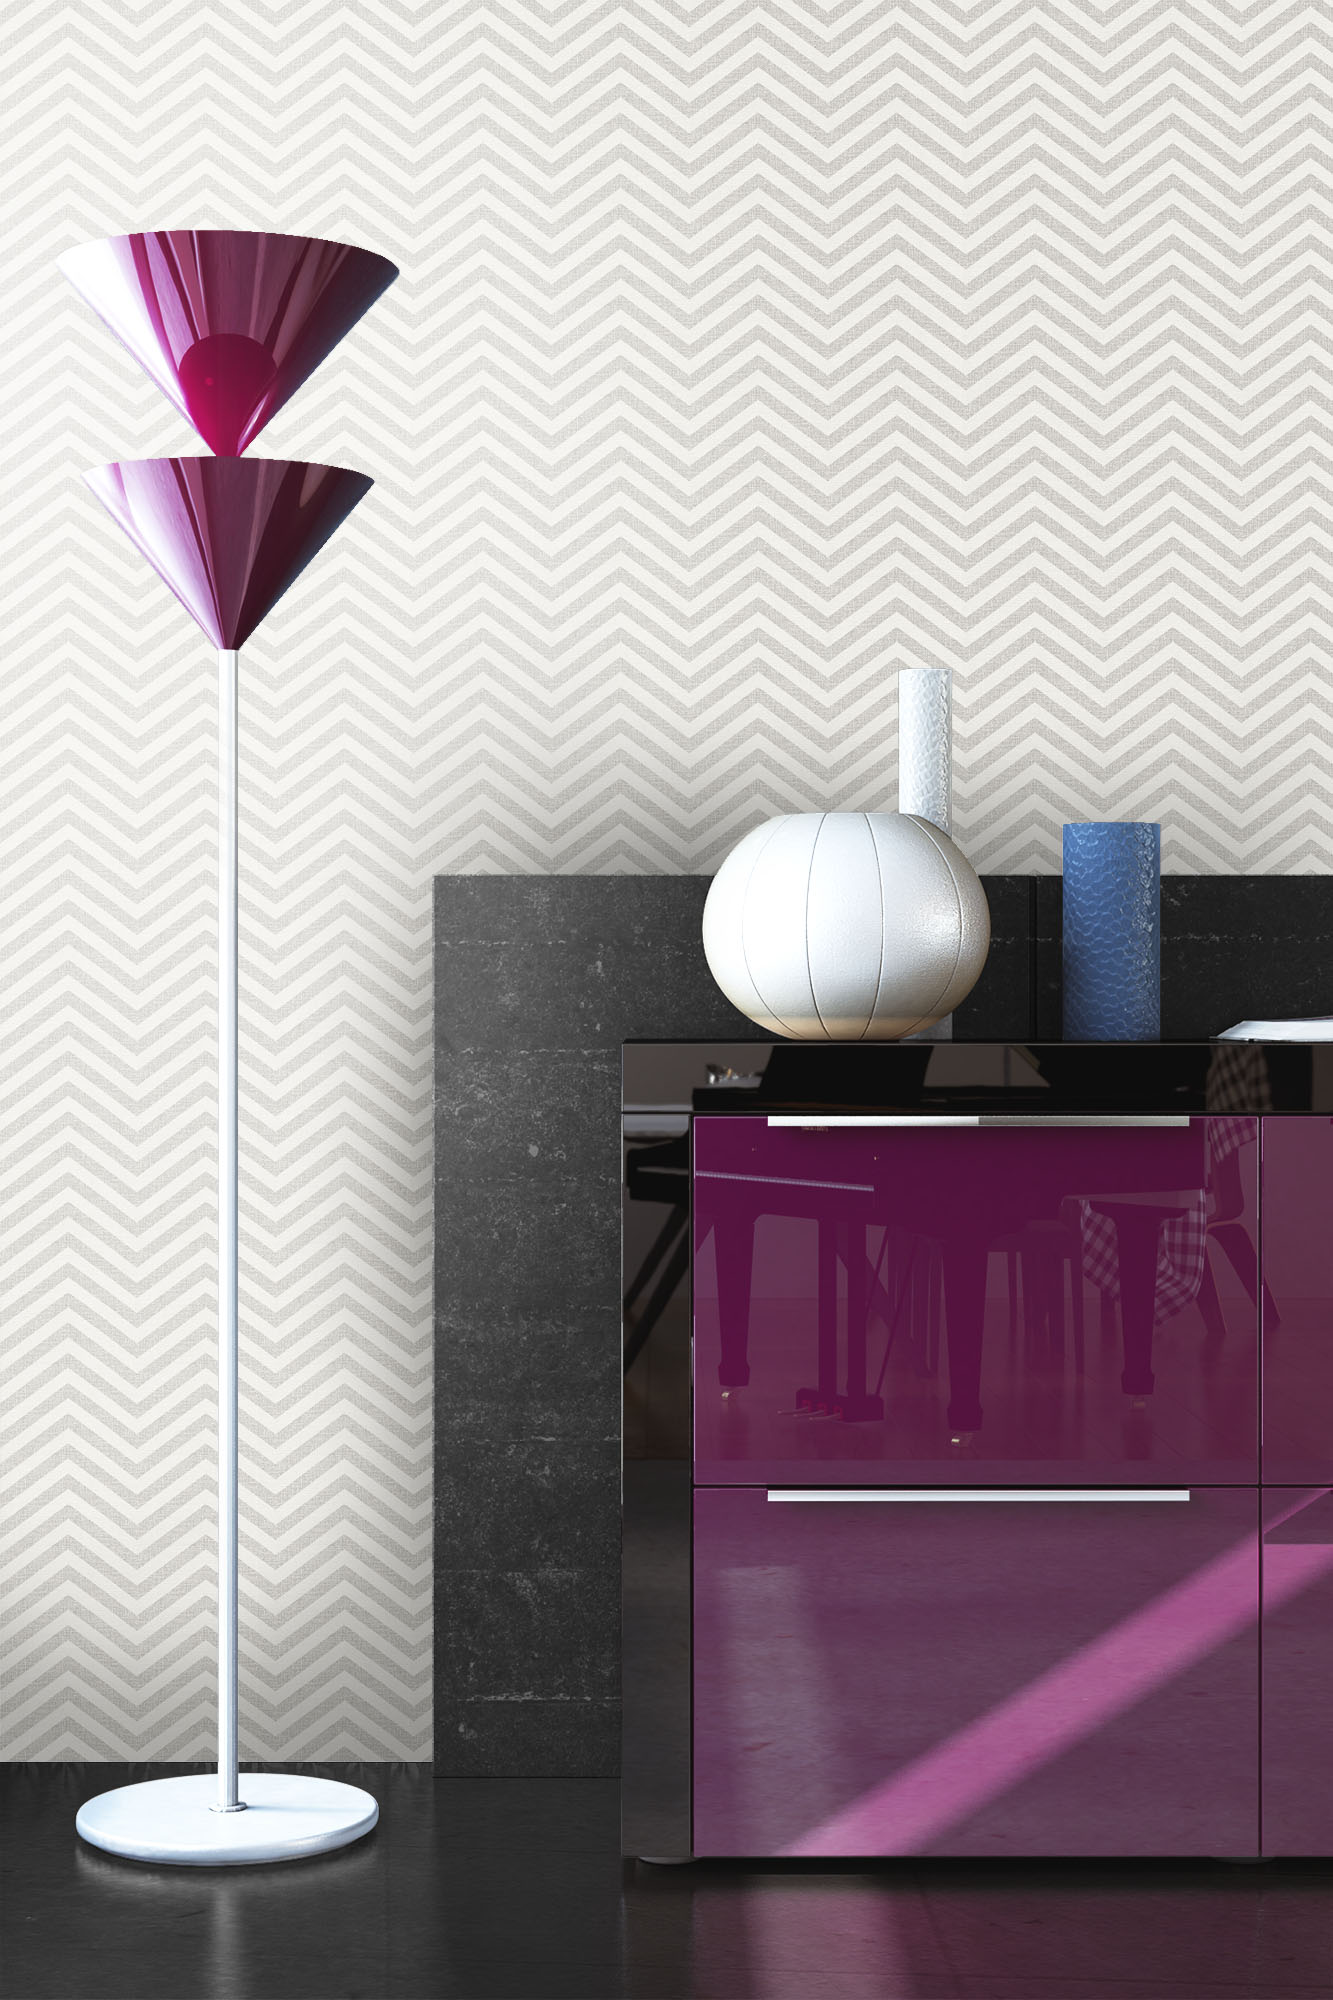 NEWROOM Vliestapete Grau   Grafik Vlies Creme Retro 3D Optik Vlies Tapete